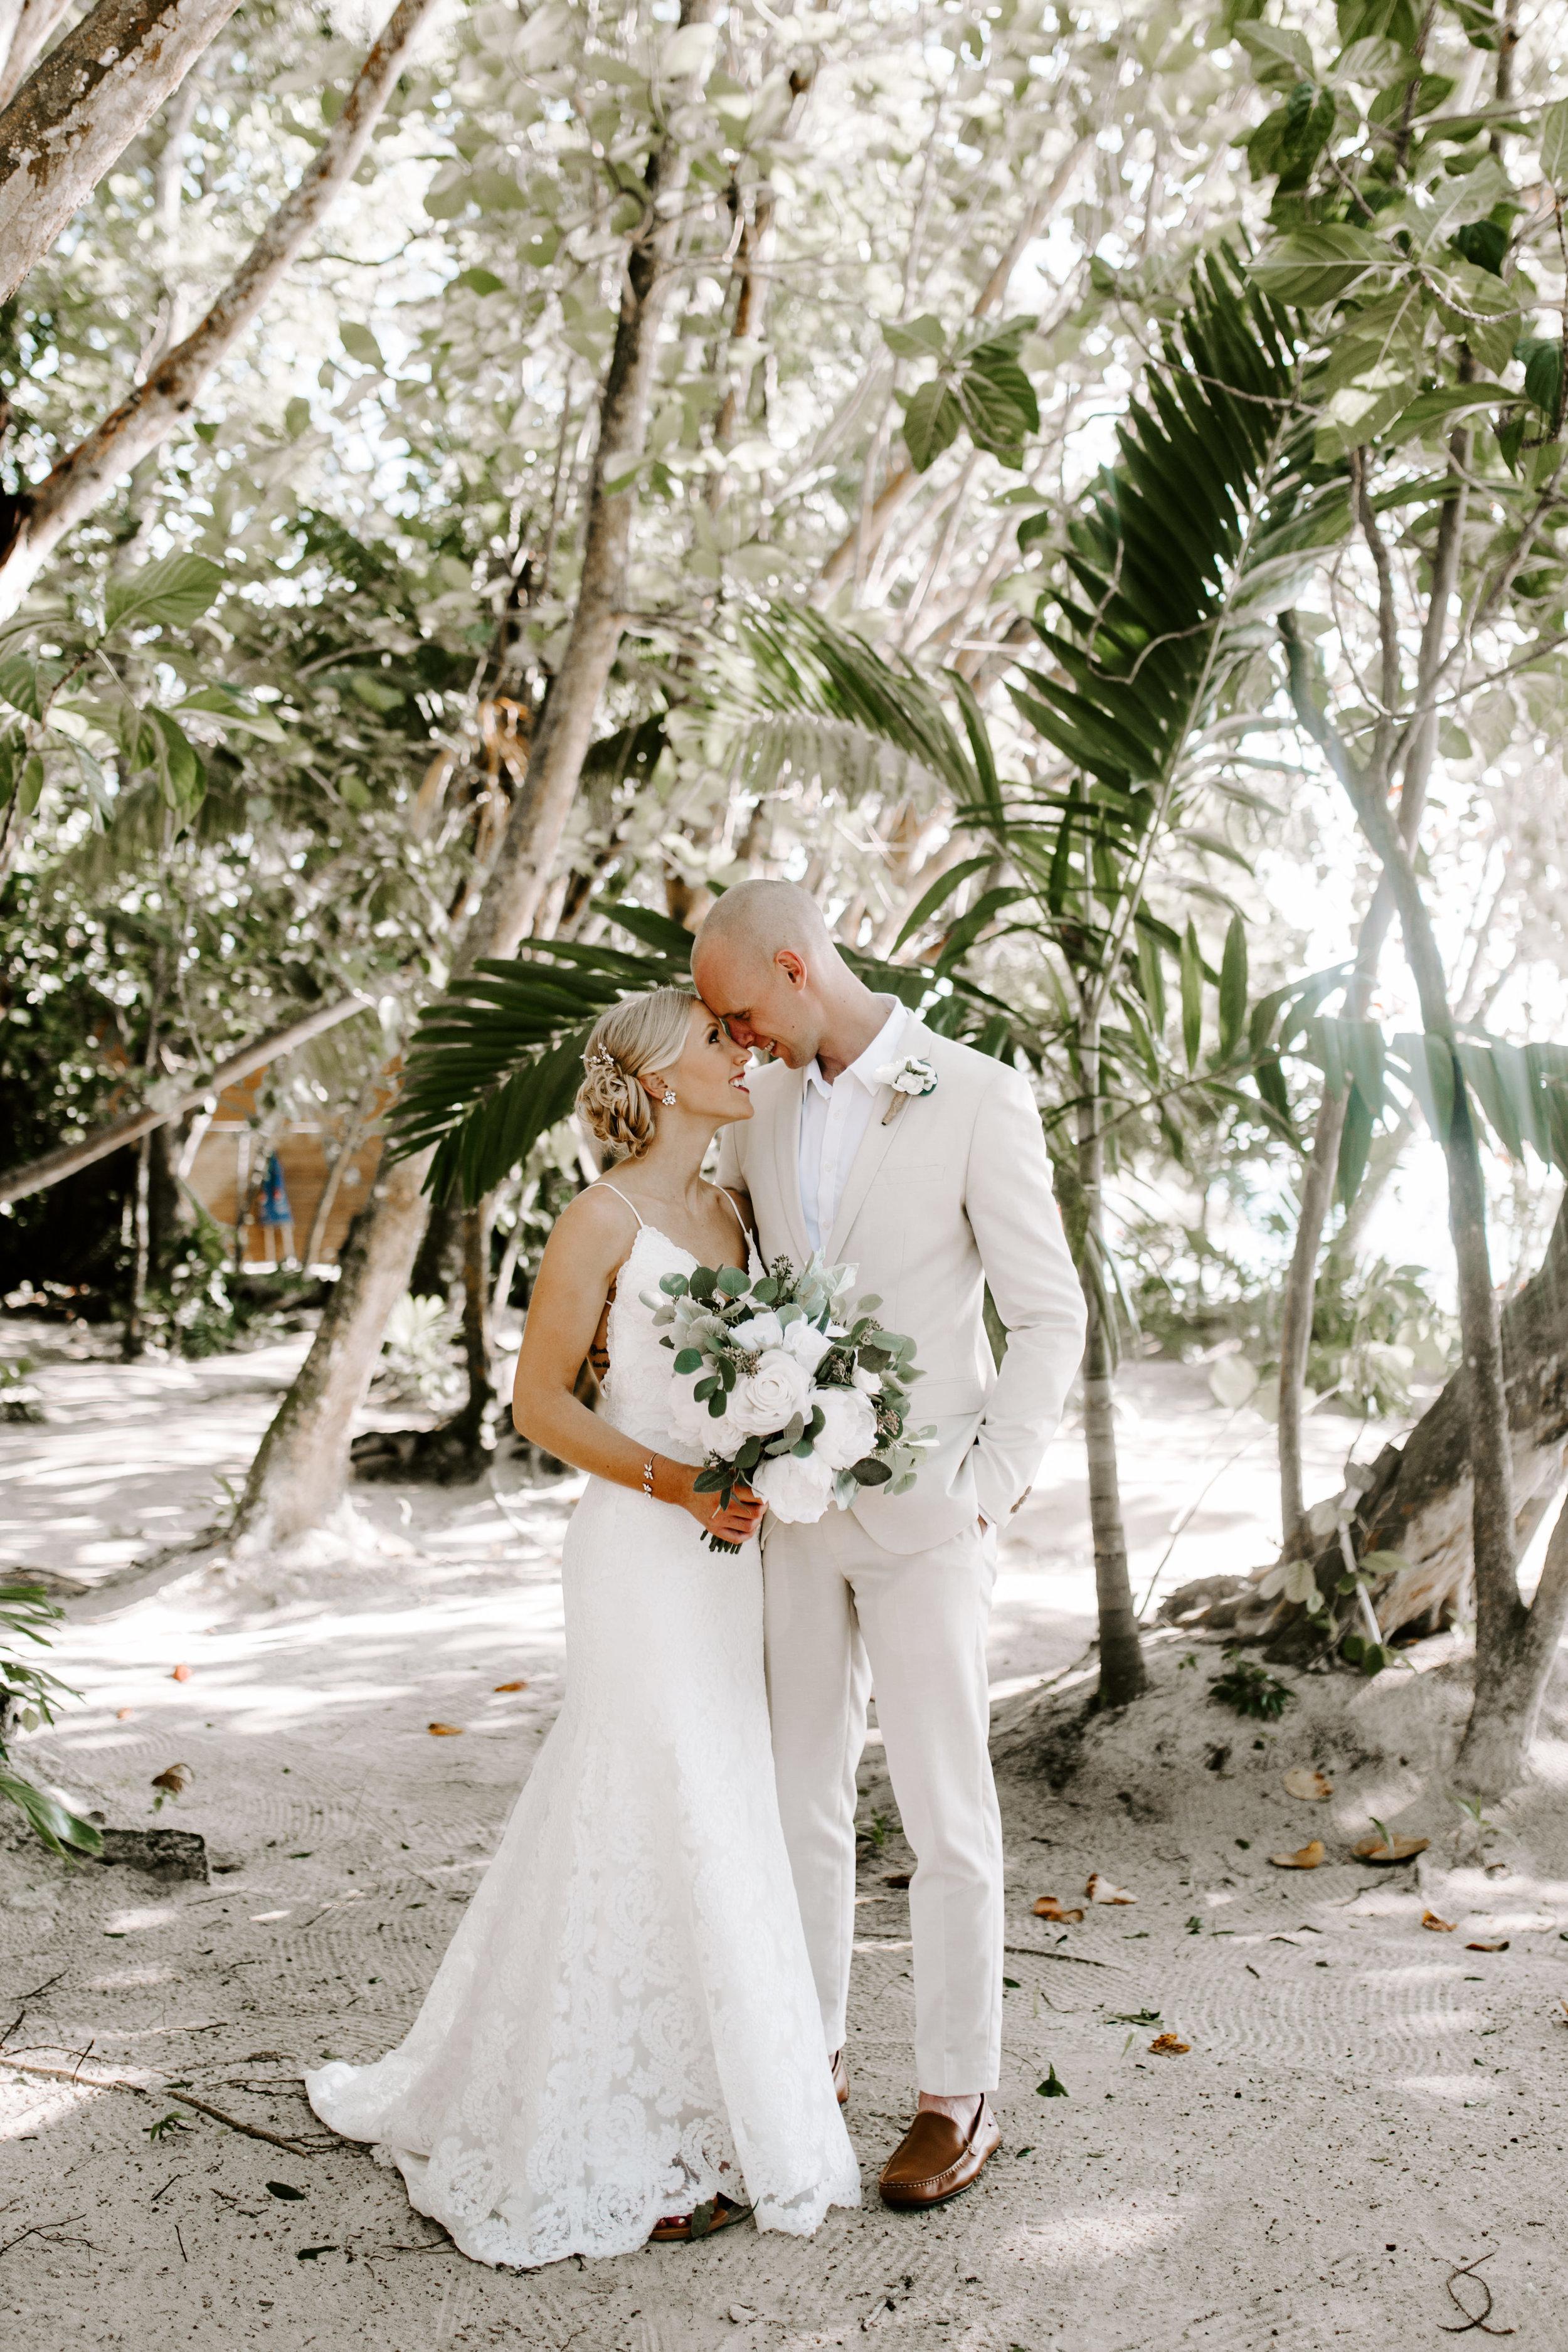 beach wedding, destination wedding, jamaica wedding, katie may, katie may bridal, wedding dress, beach wedding dress, define fettle